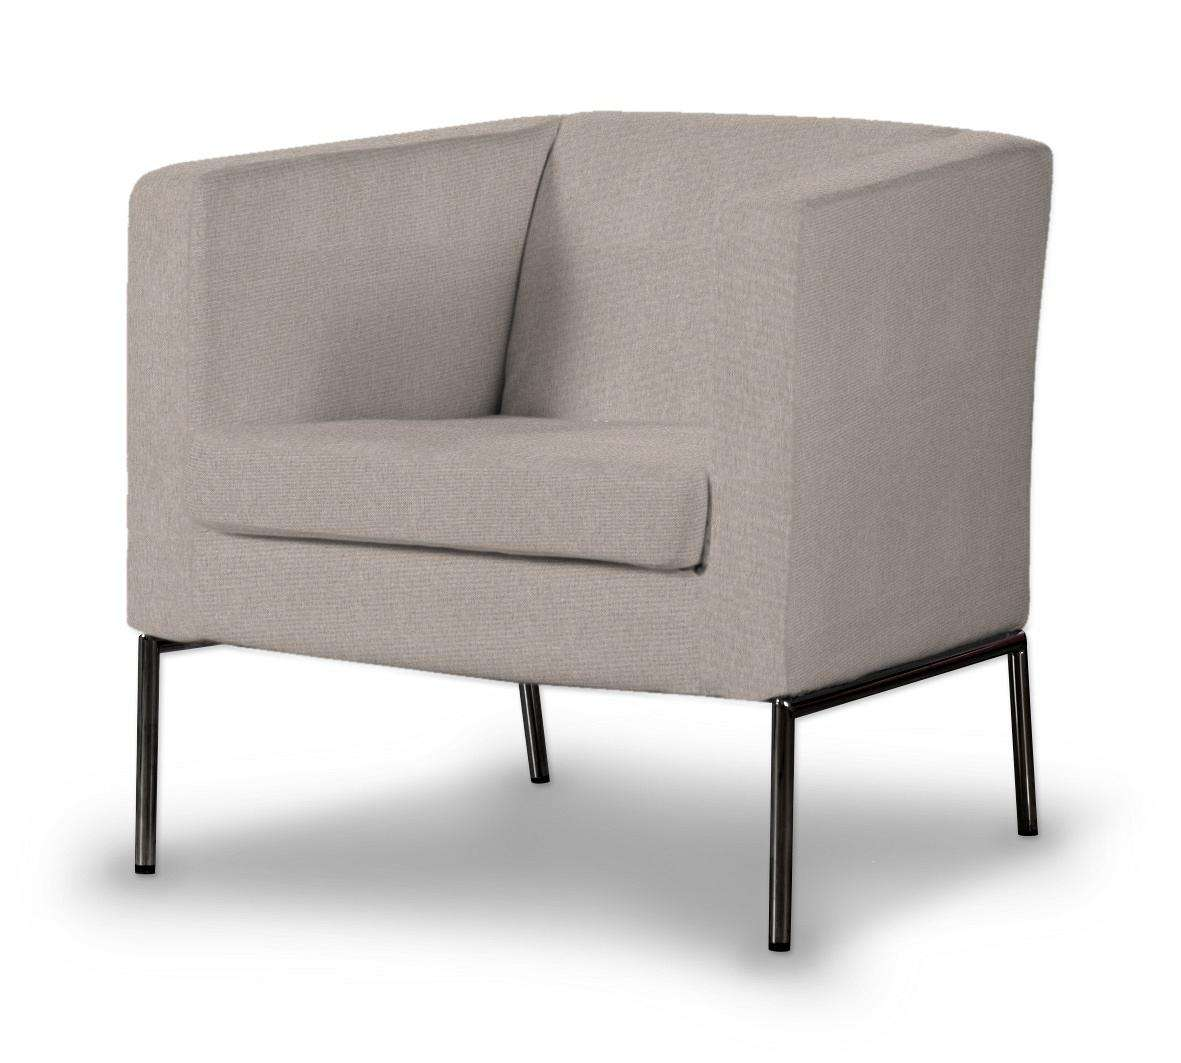 Klappsta Sesselbezug Sessel Klappsta von der Kollektion Etna, Stoff: 705-09